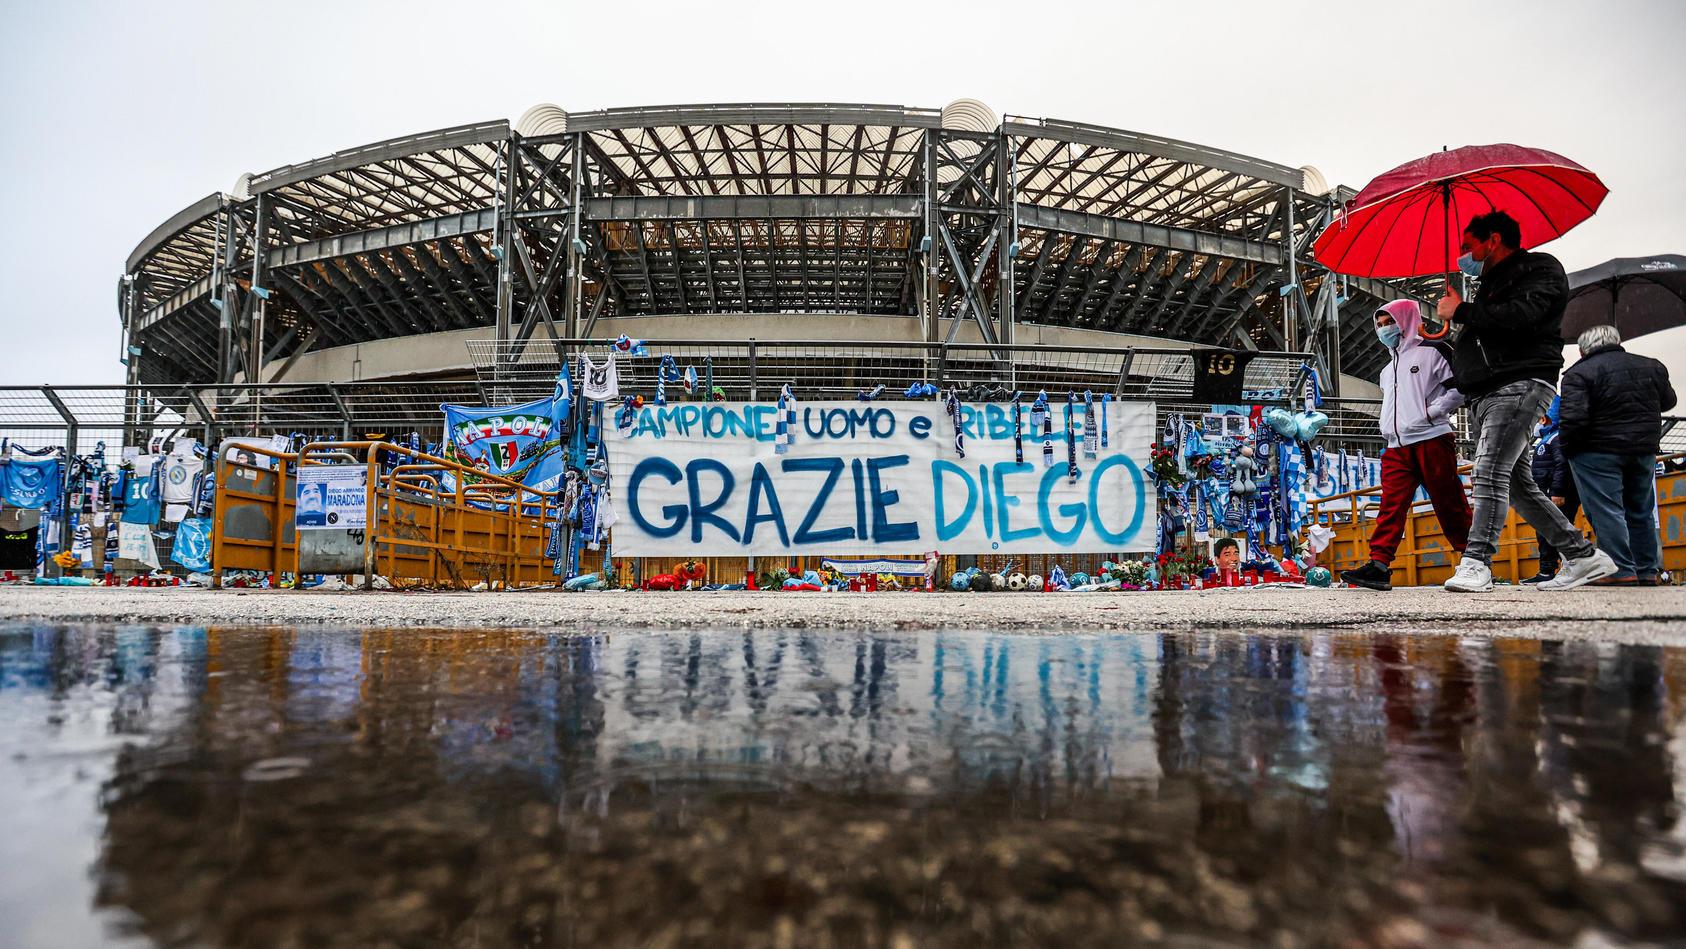 Das frühere Stadio San Paolo trägt jetzt Maradonas Namen